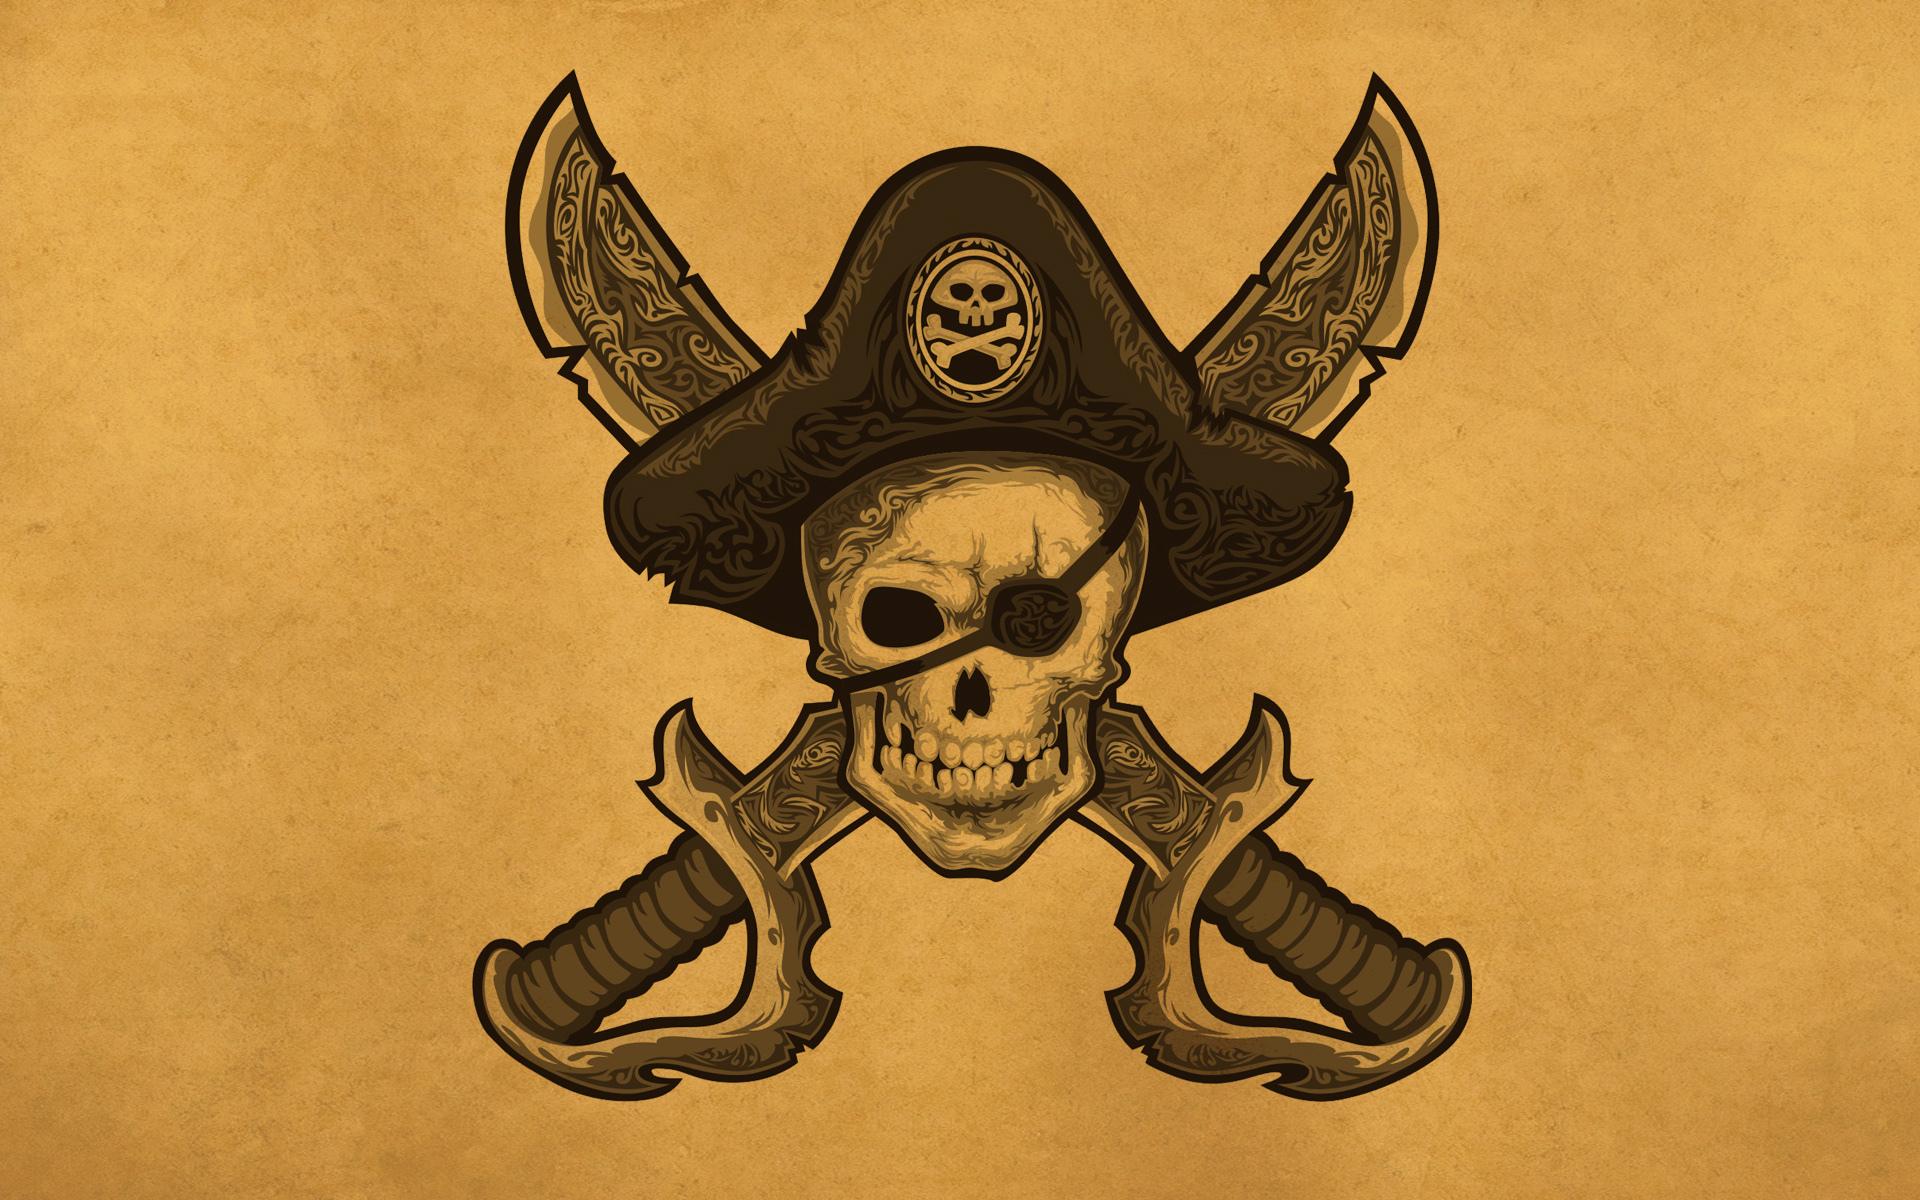 wallpaper skull bones pirate - photo #10